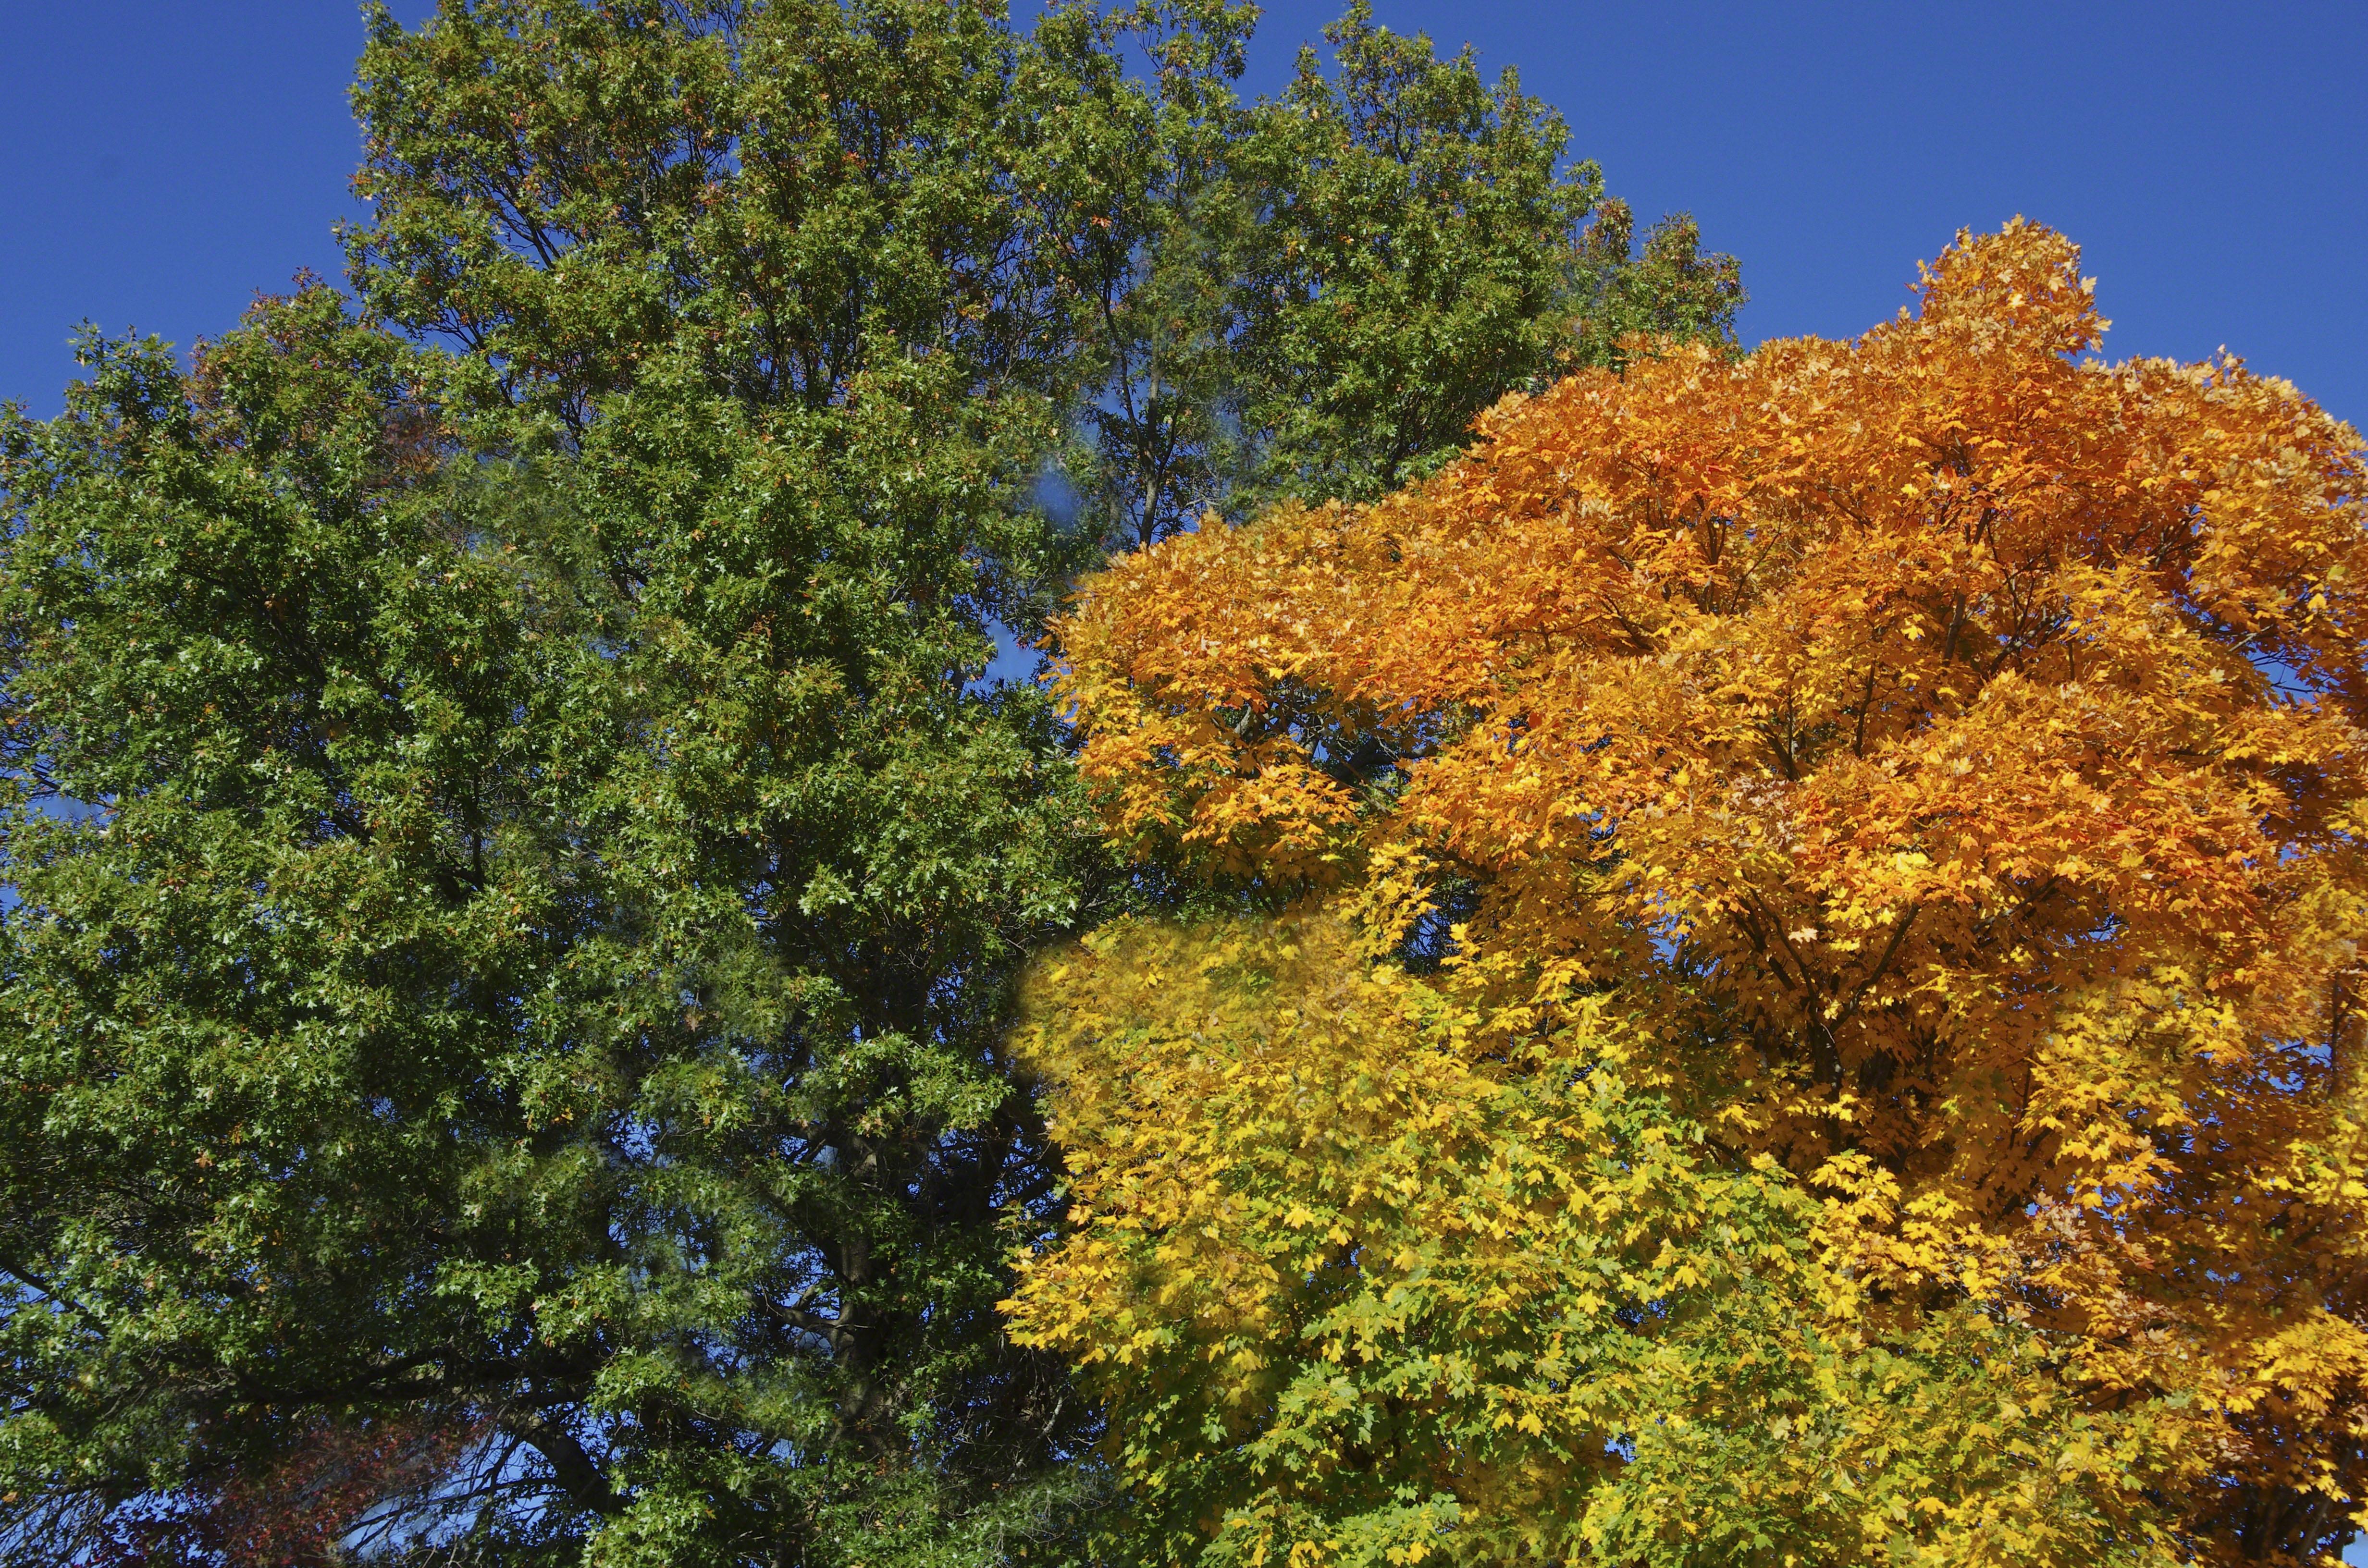 Fotos gratis rbol flor hojas perennes temporada for Plantas de hojas perennes para jardin